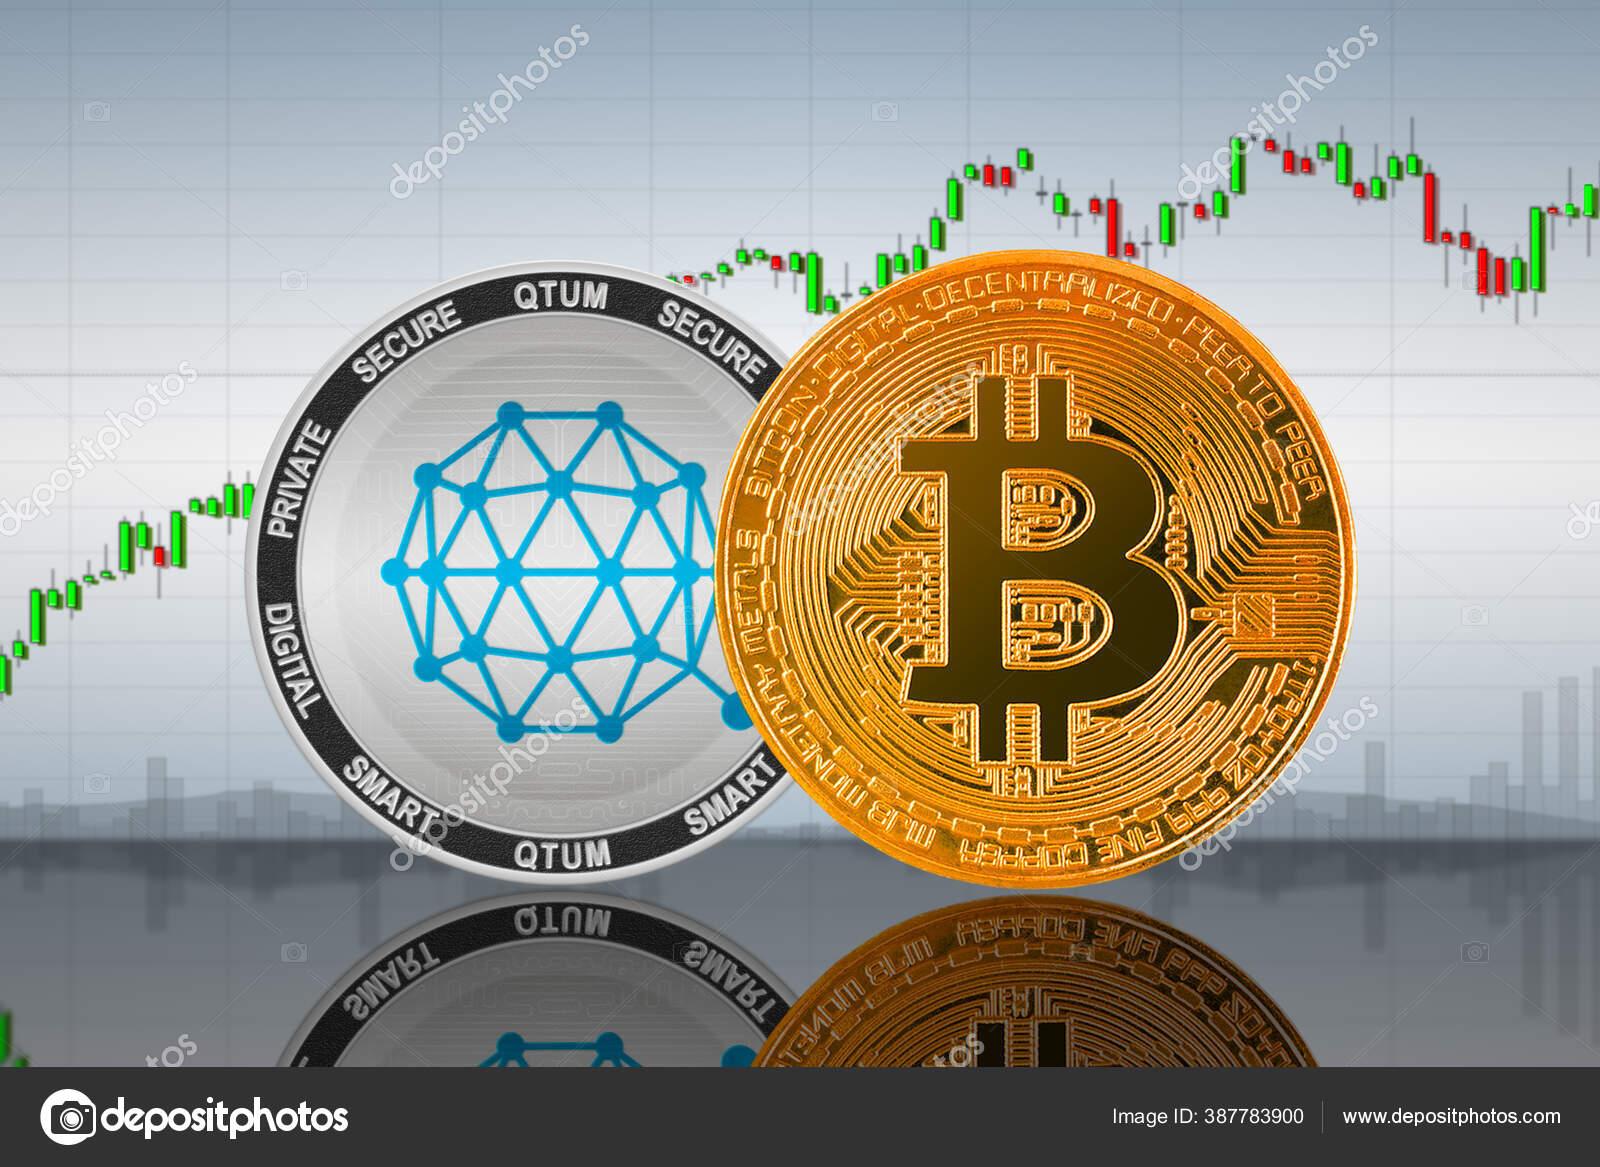 Qtum - Bitcoin (QTUM/BTC) Convertor Valutar, Ratele de schimb valutar | CoinYEP